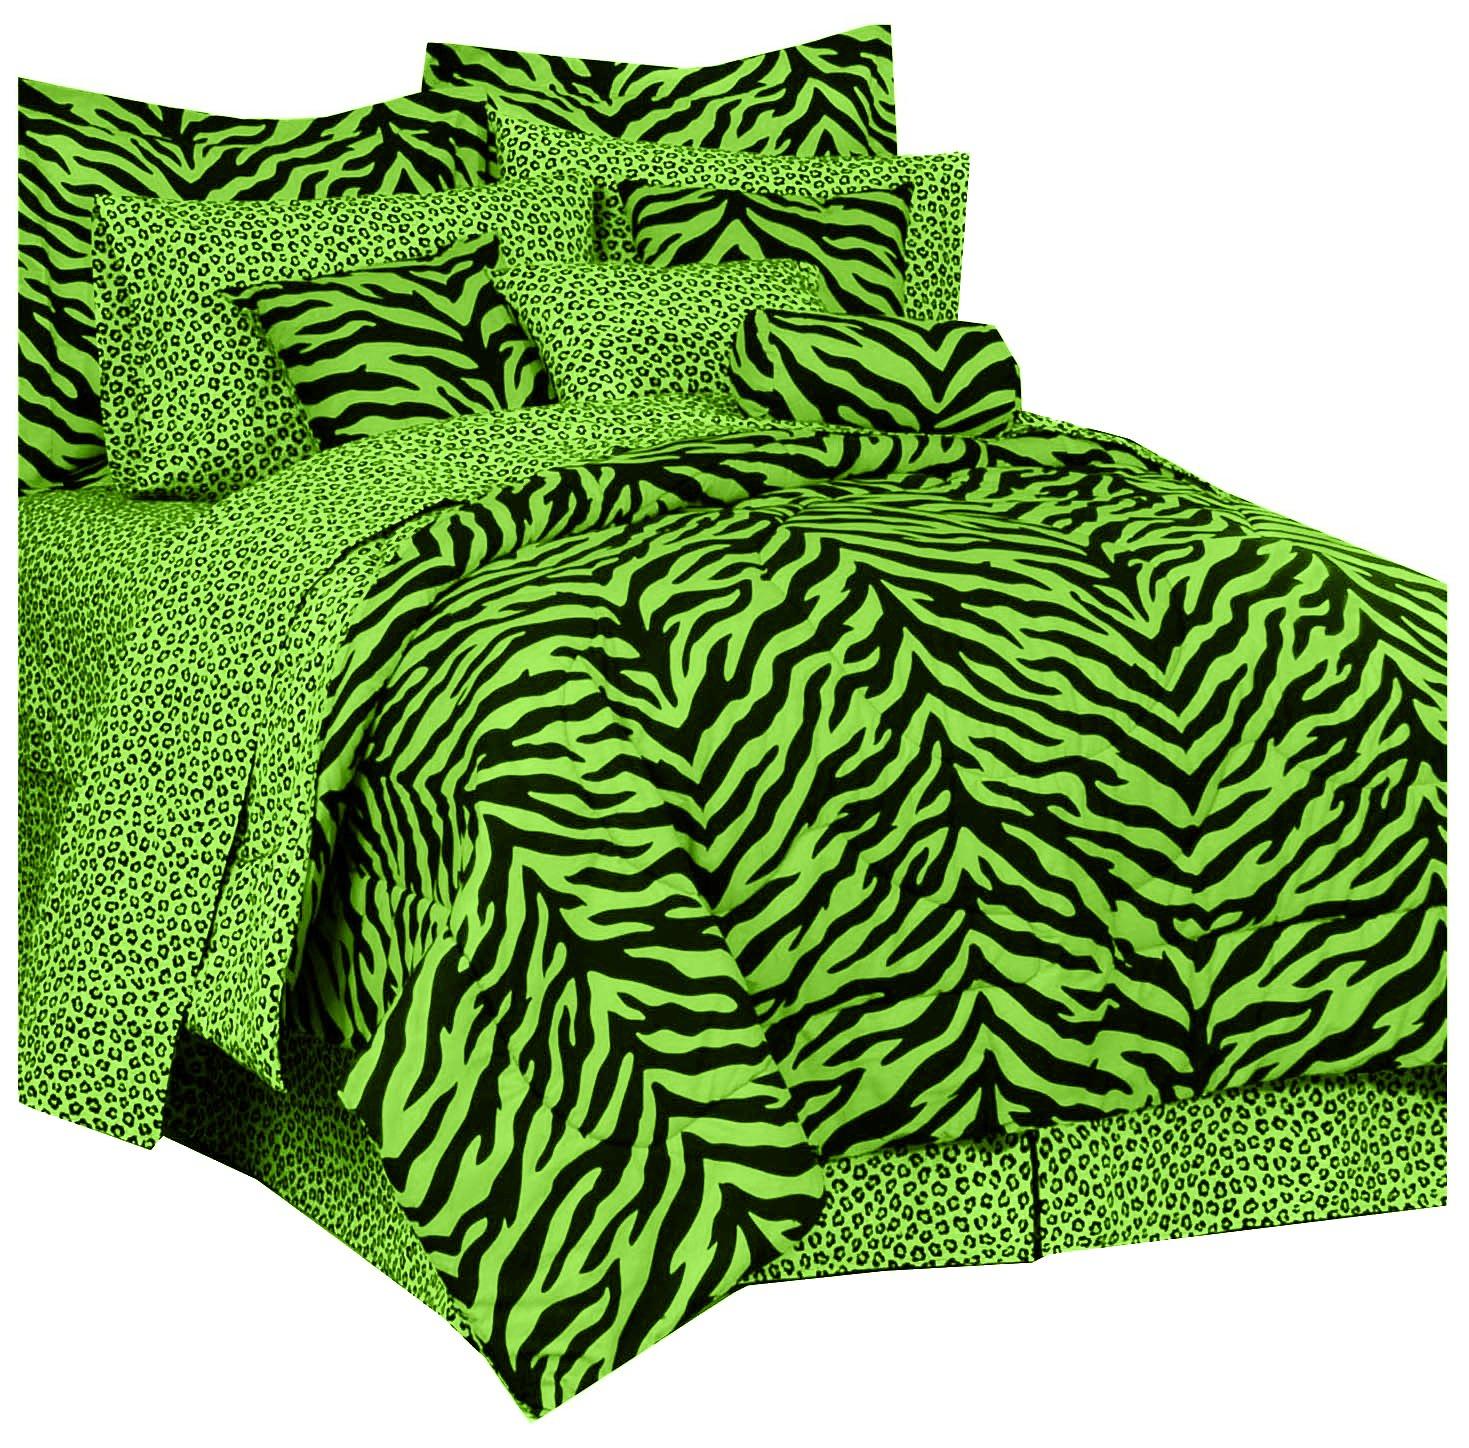 Karin Maki Zebra Complete Bedding Set, X-Large Twin, Lavender Kimlor Inc. 07178400095KM